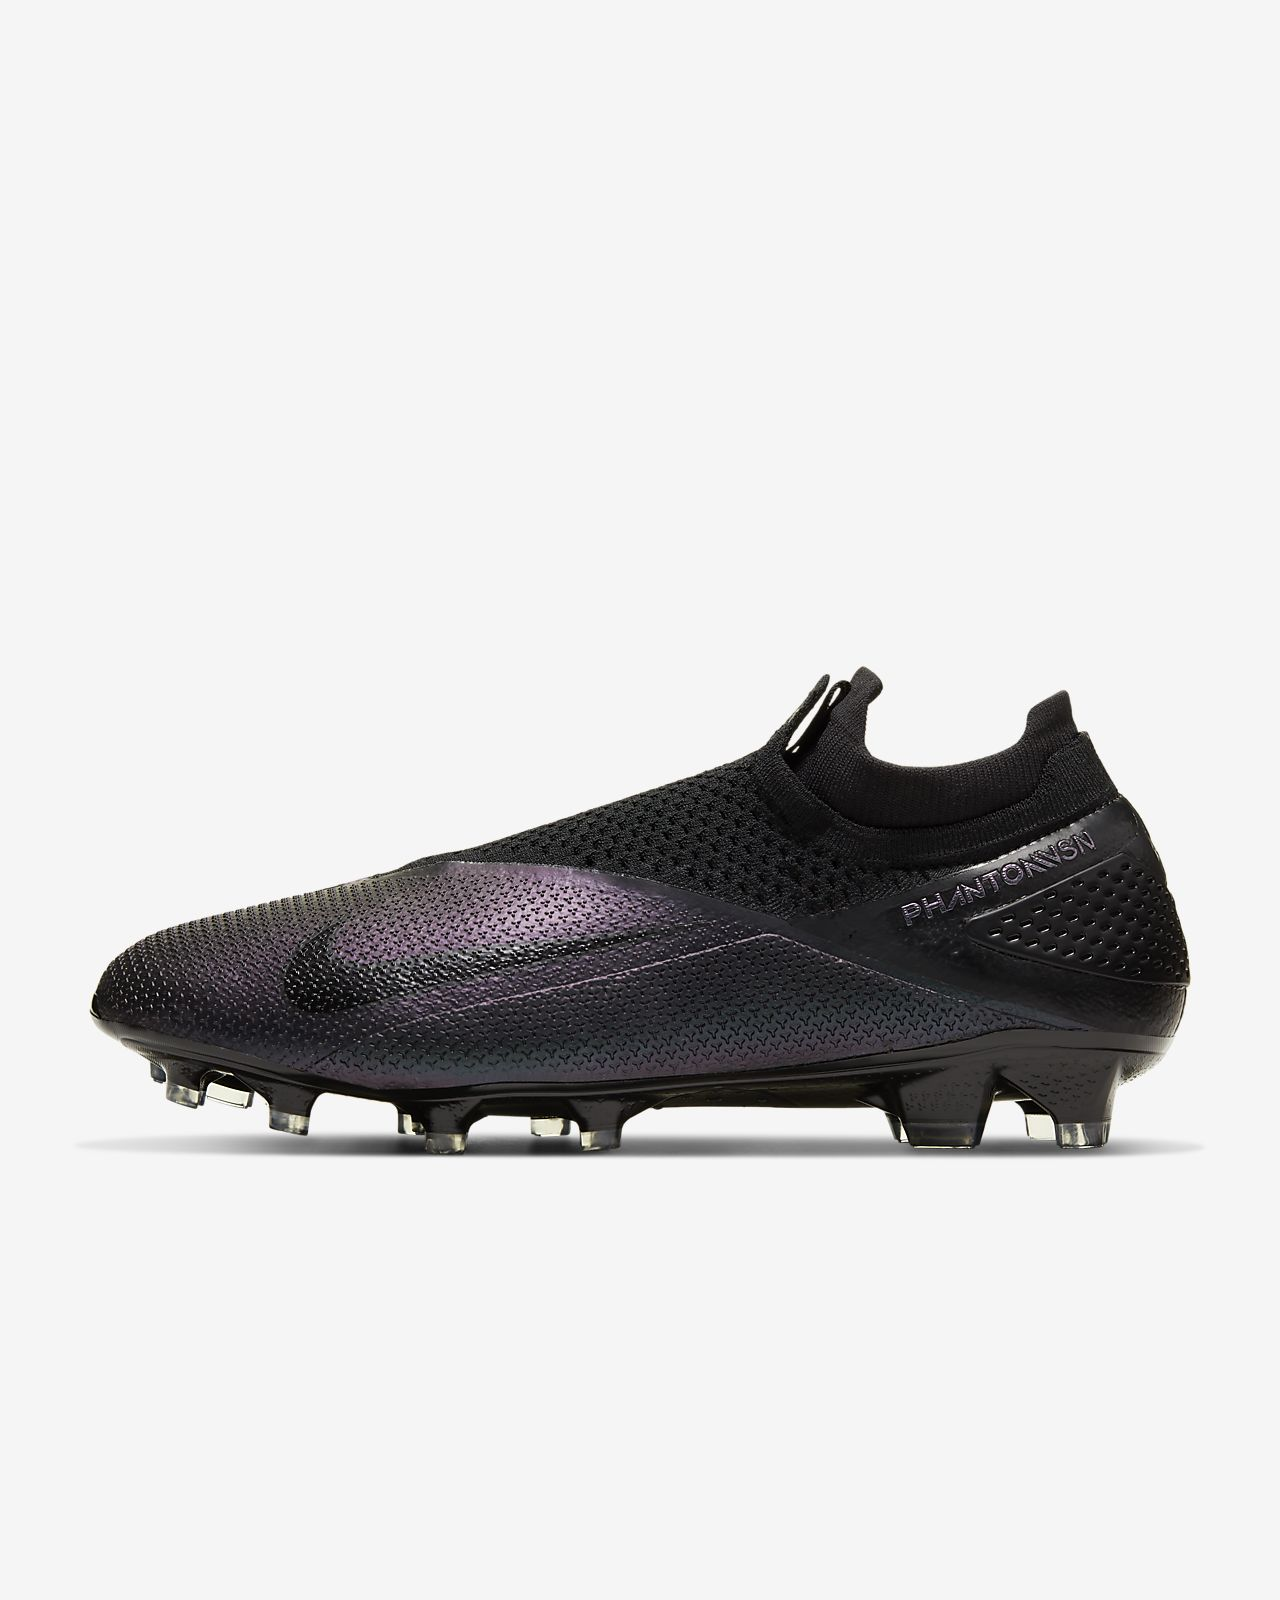 Calzado de fútbol para terreno firme Nike Phantom Vision 2 Elite Dynamic Fit FG